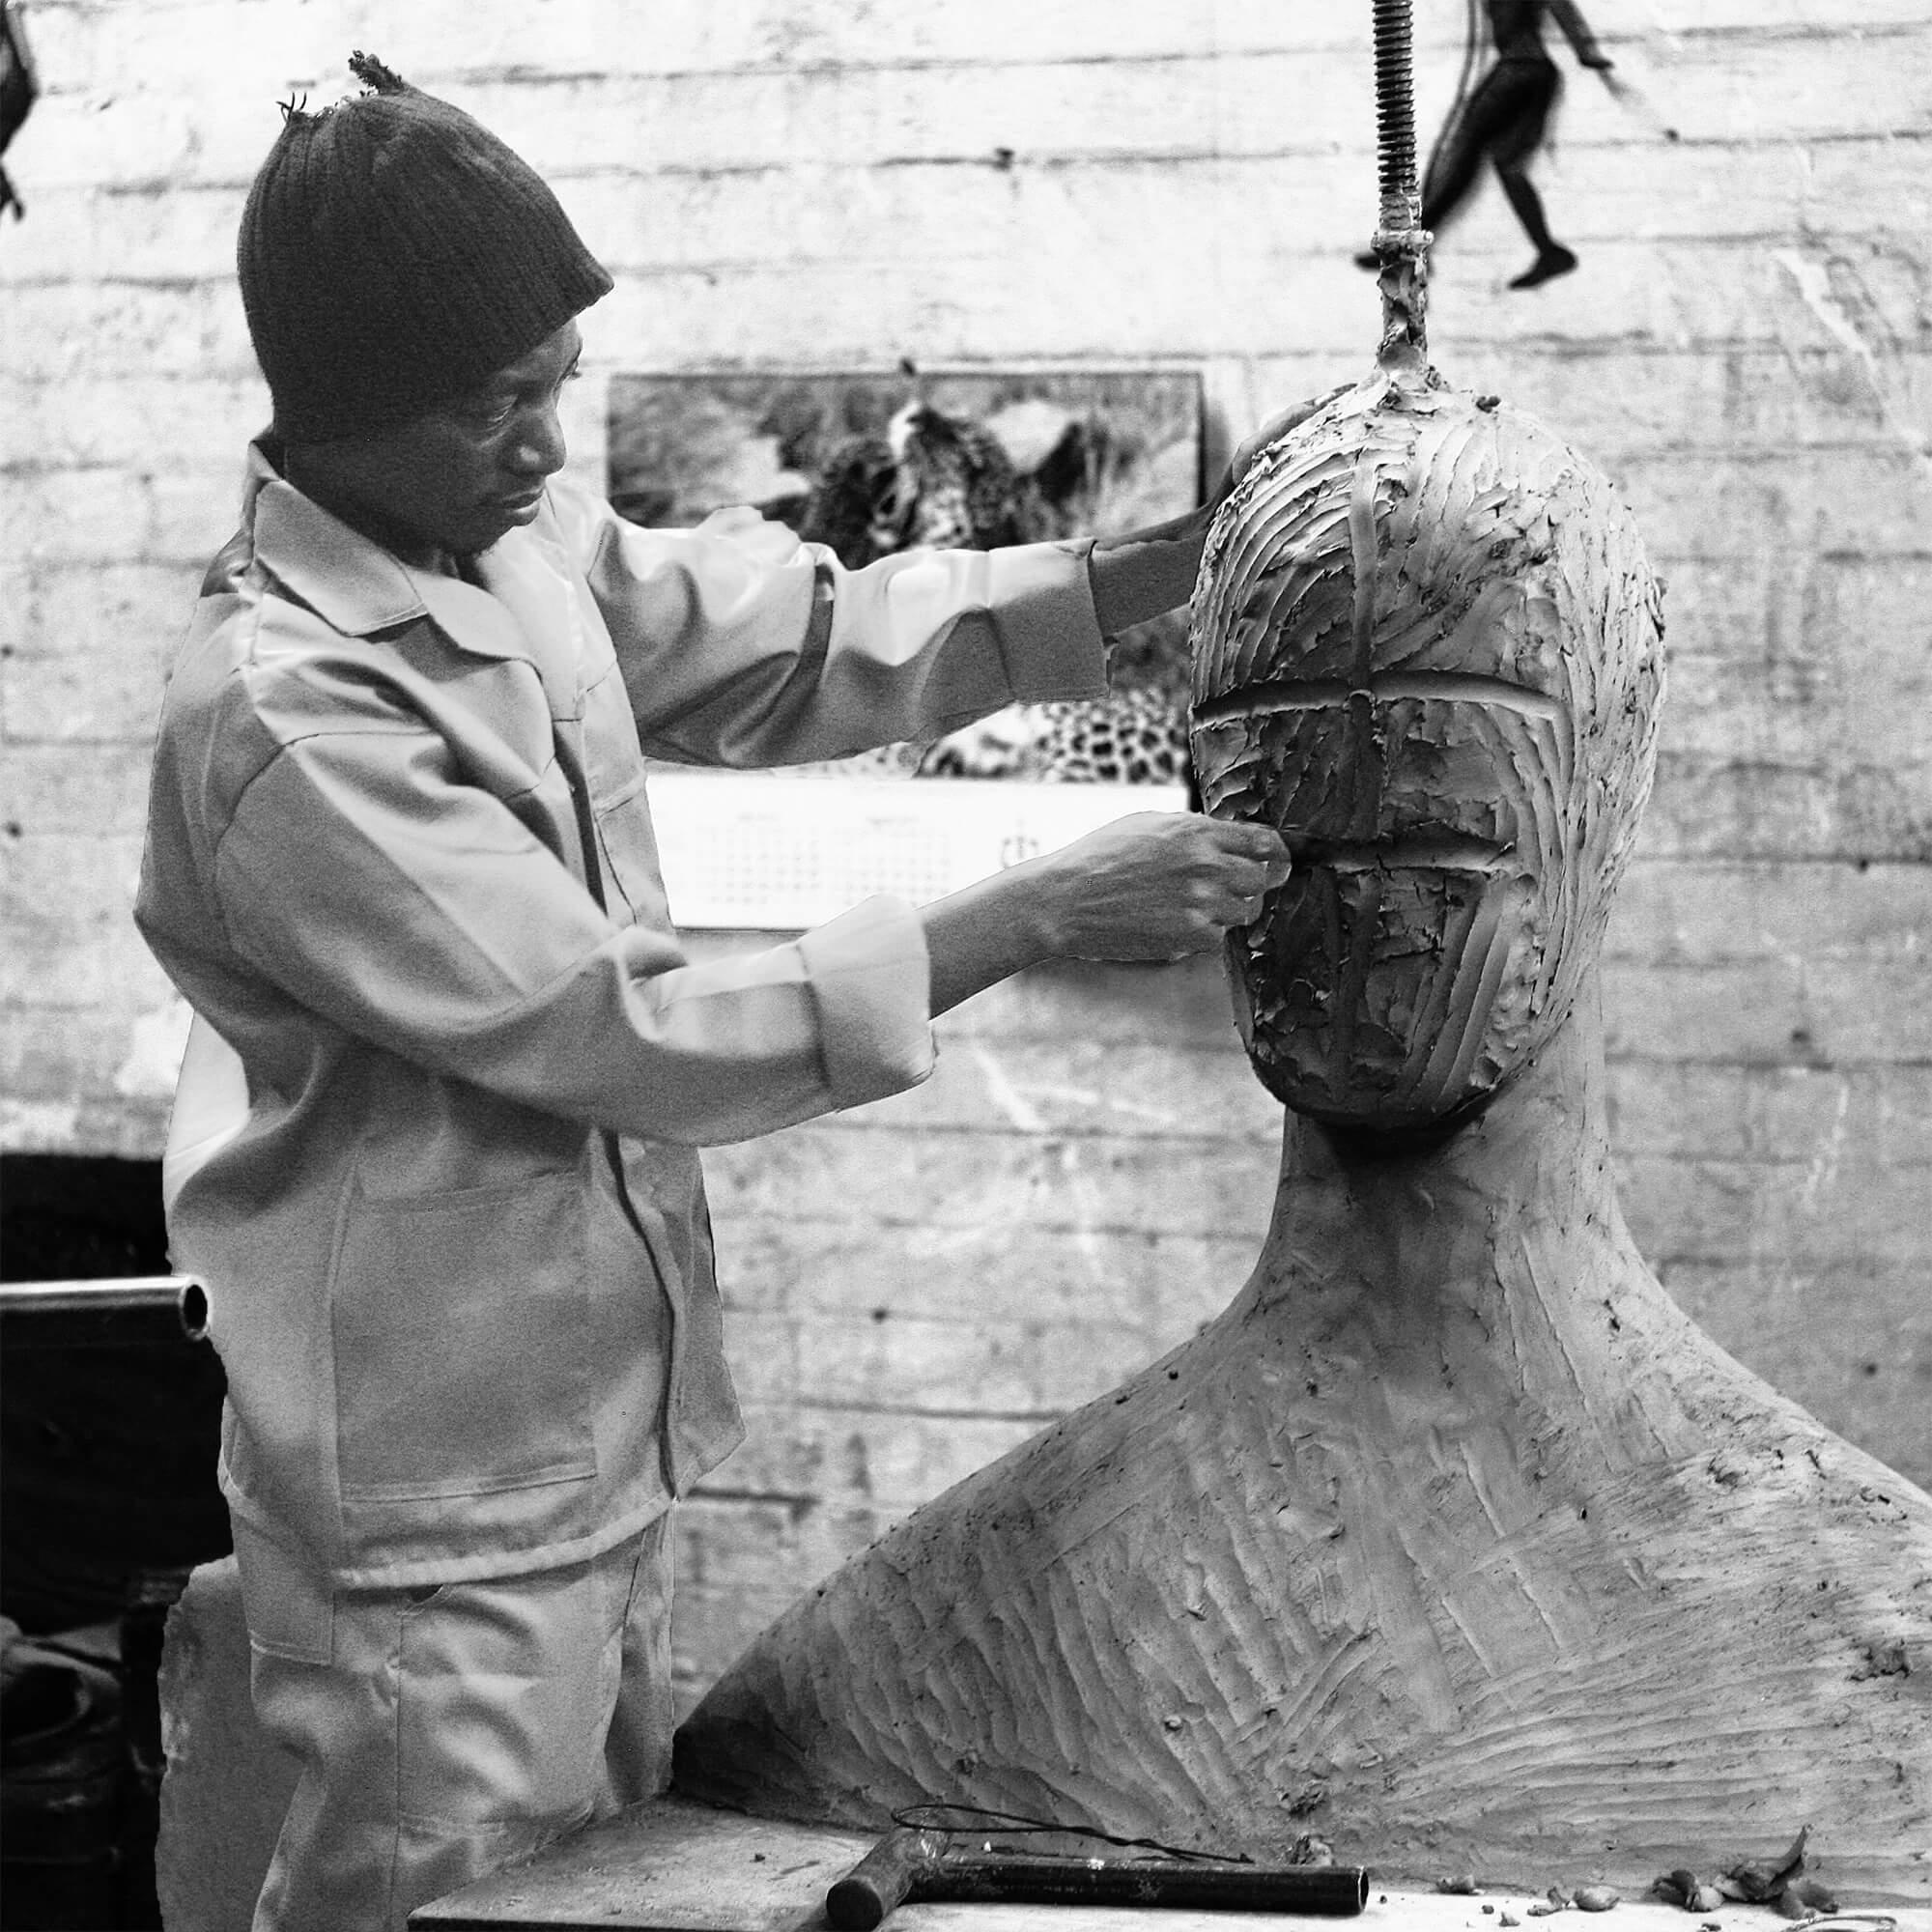 sculptor-new-forest-film-co.jpg